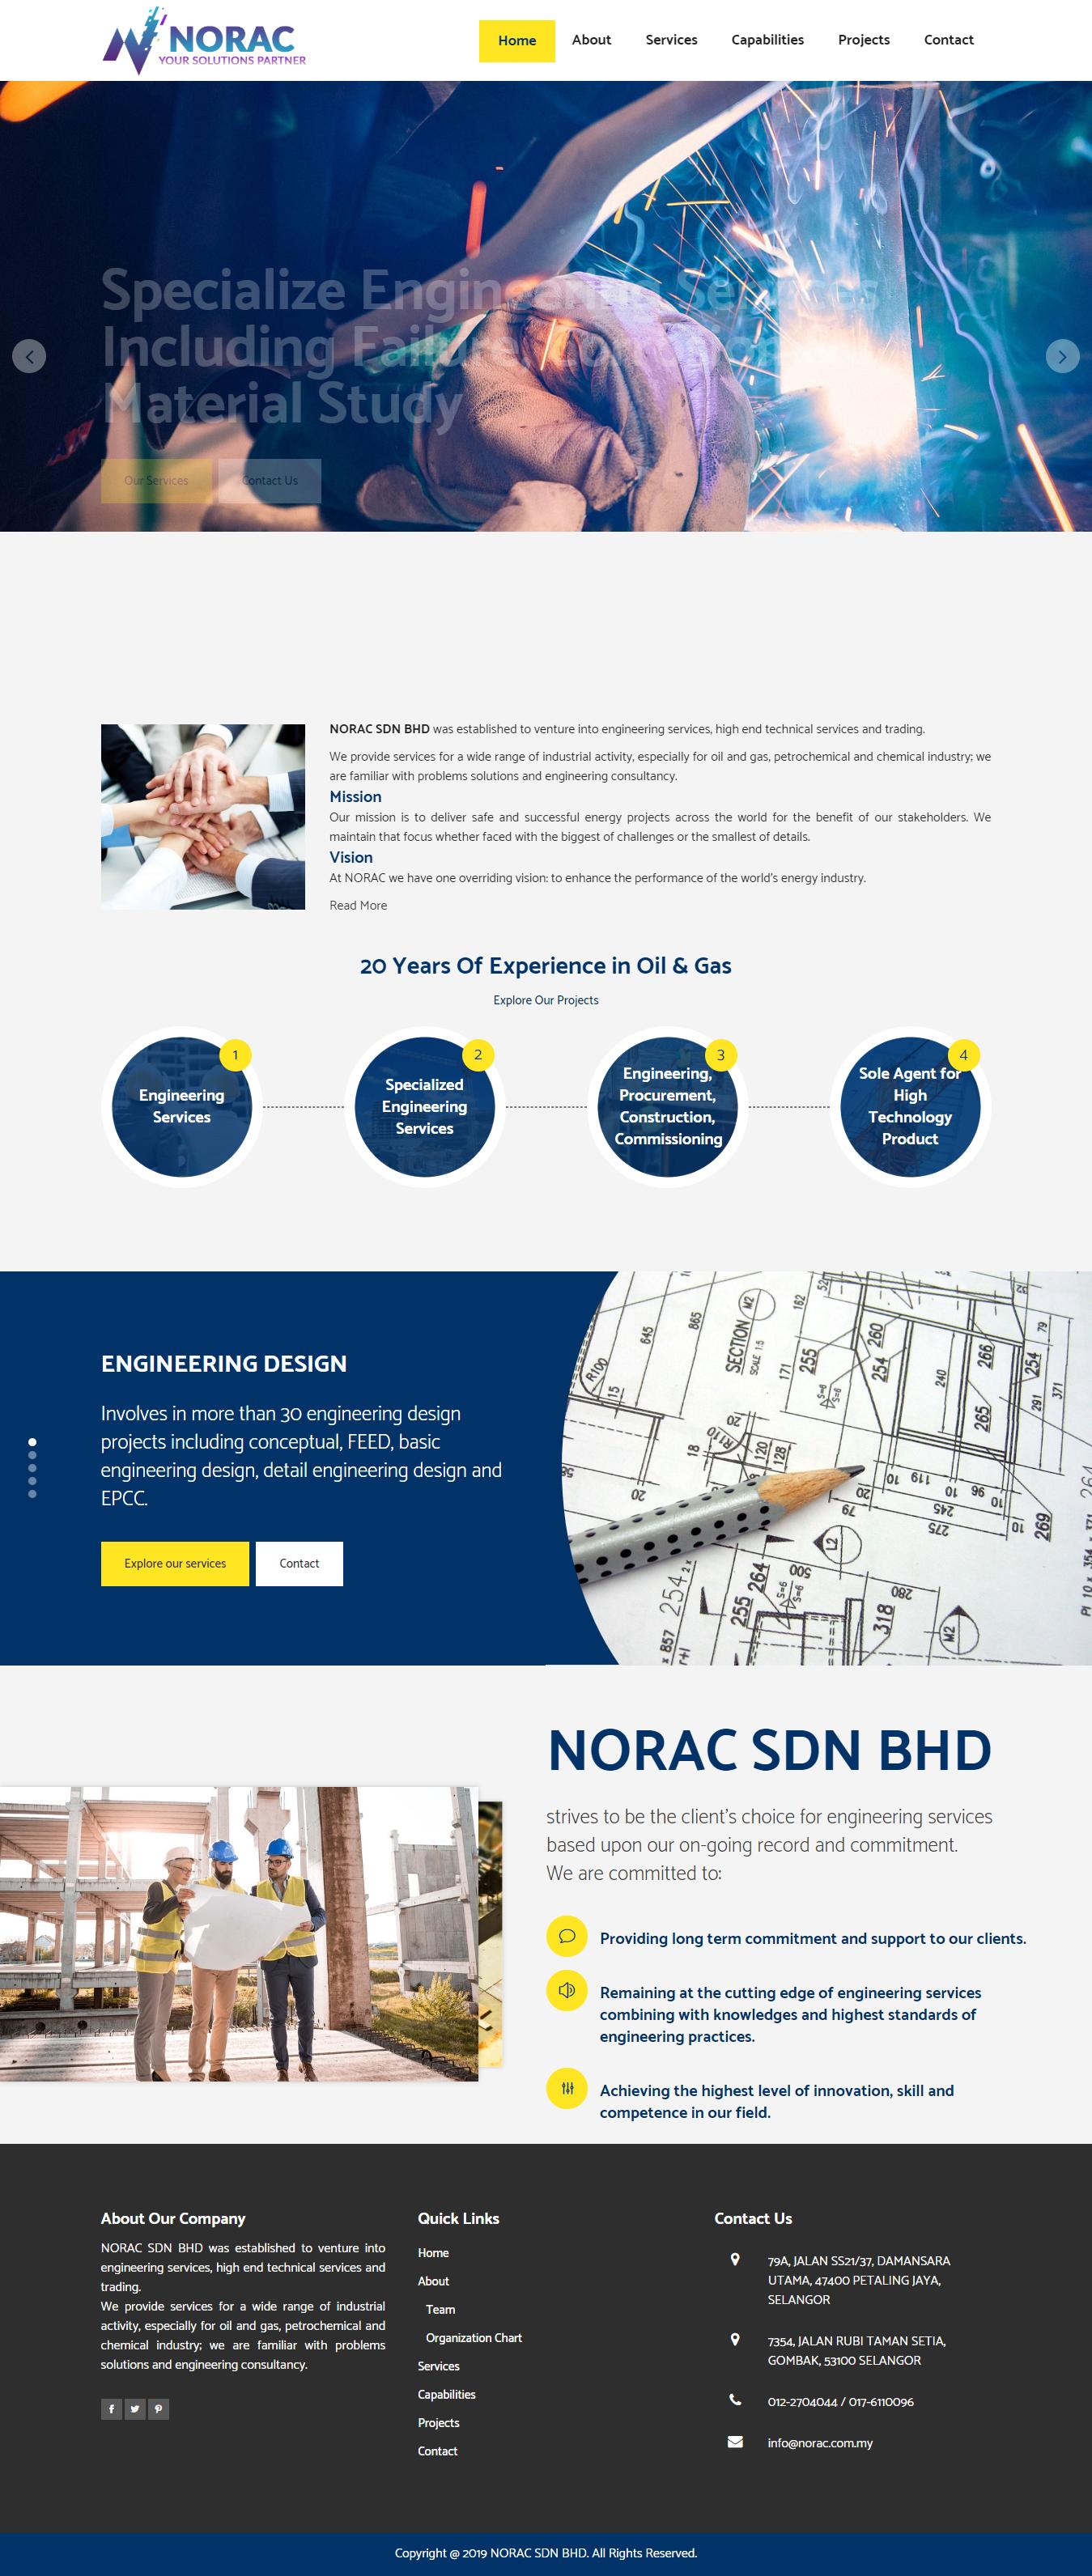 Corporate Websites Small Business Online Magazines Newspapers Publications Community Portals Ecom Cheap Web Design Web Development Design Web Design